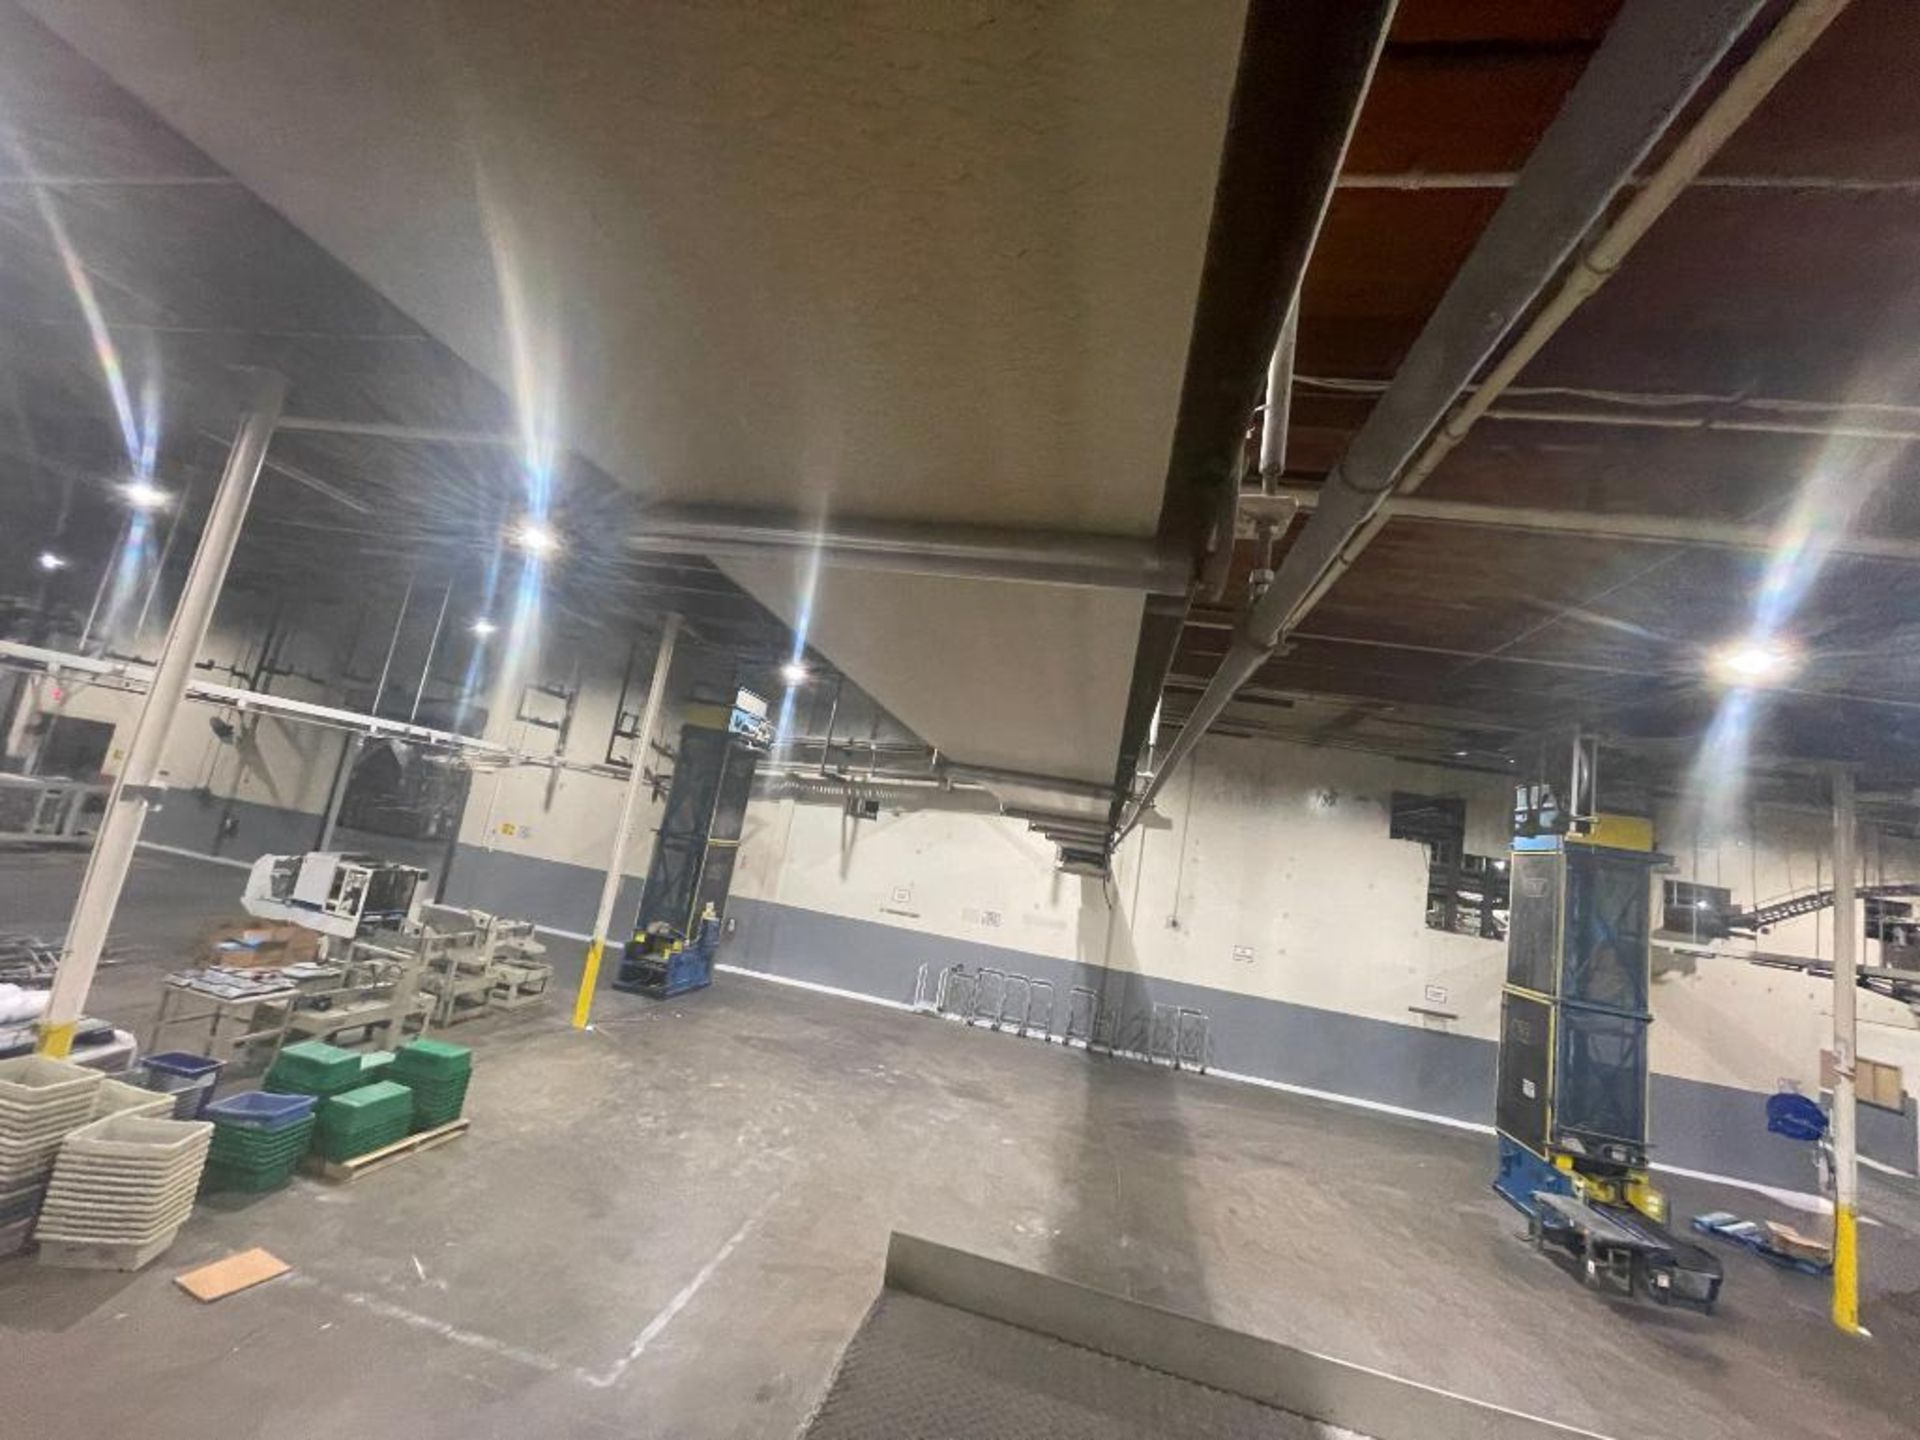 4 Aseeco mild steel conveyors - Image 8 of 14